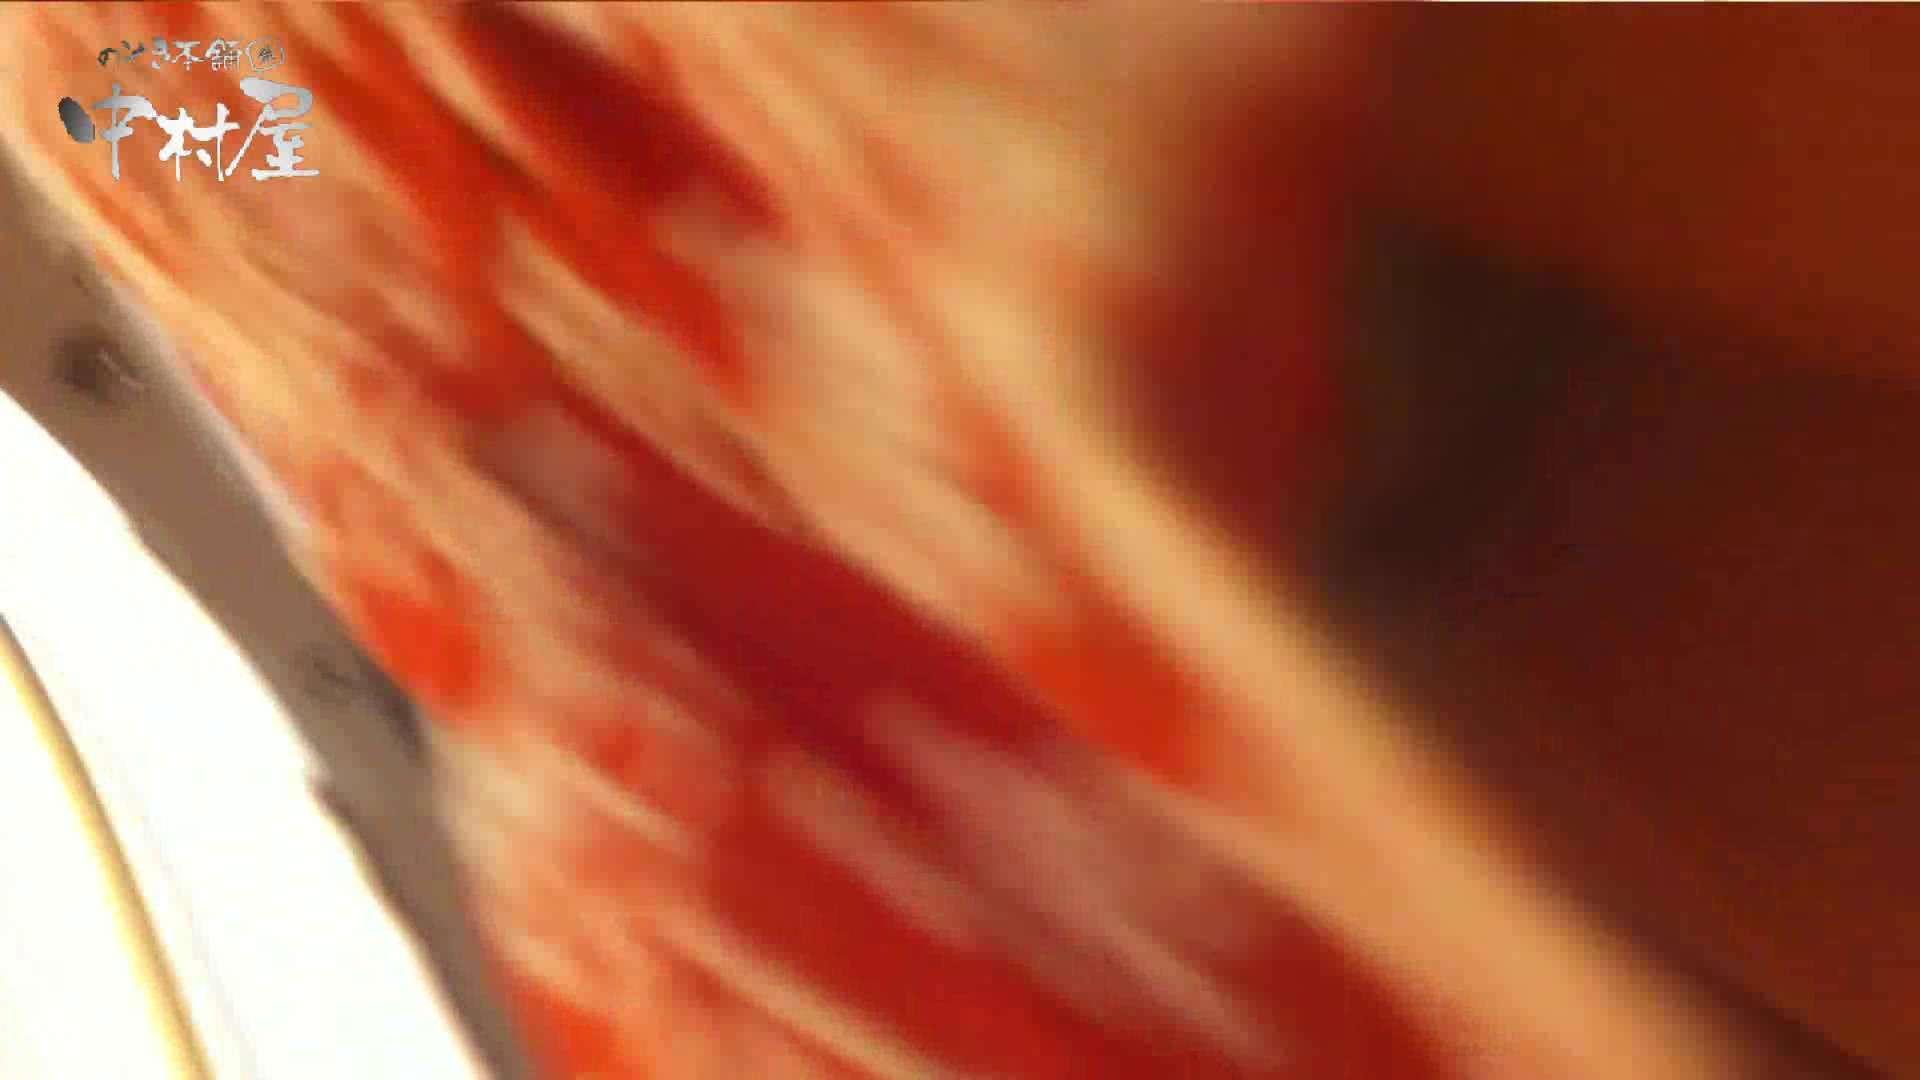 vol.43 可愛いカリスマ店員限定‼胸チラ&パンチラ 美脚おねーさんの胸元ゲット! 接写 | 胸チラ  76PIX 13